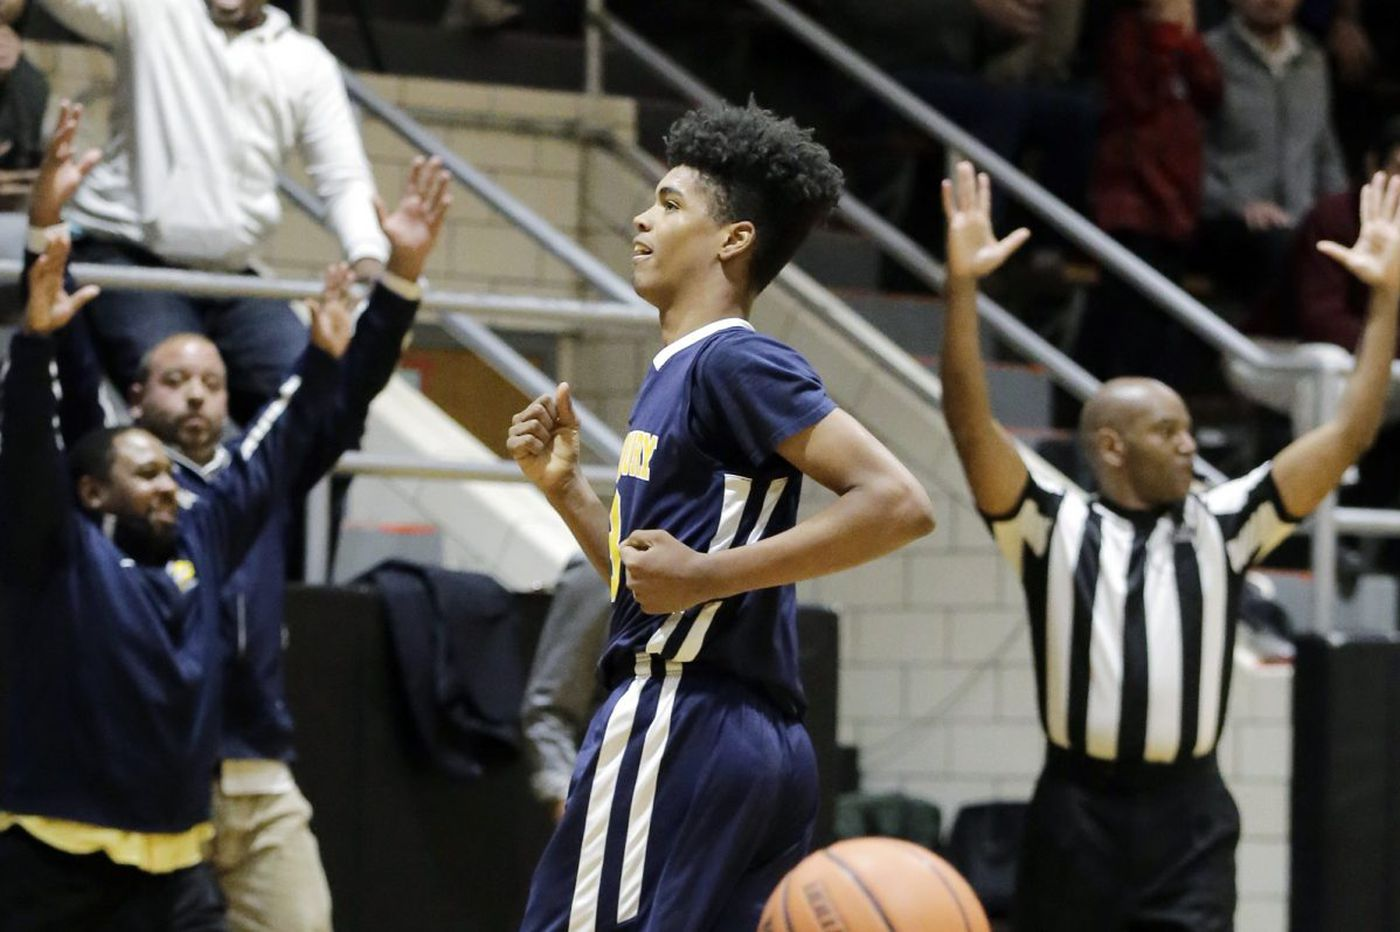 Friday's S.J. roundup: Freshman Marianna Papazoglou's all-around performance helped Wildwood Catholic girls' basketball beat Pleasantville